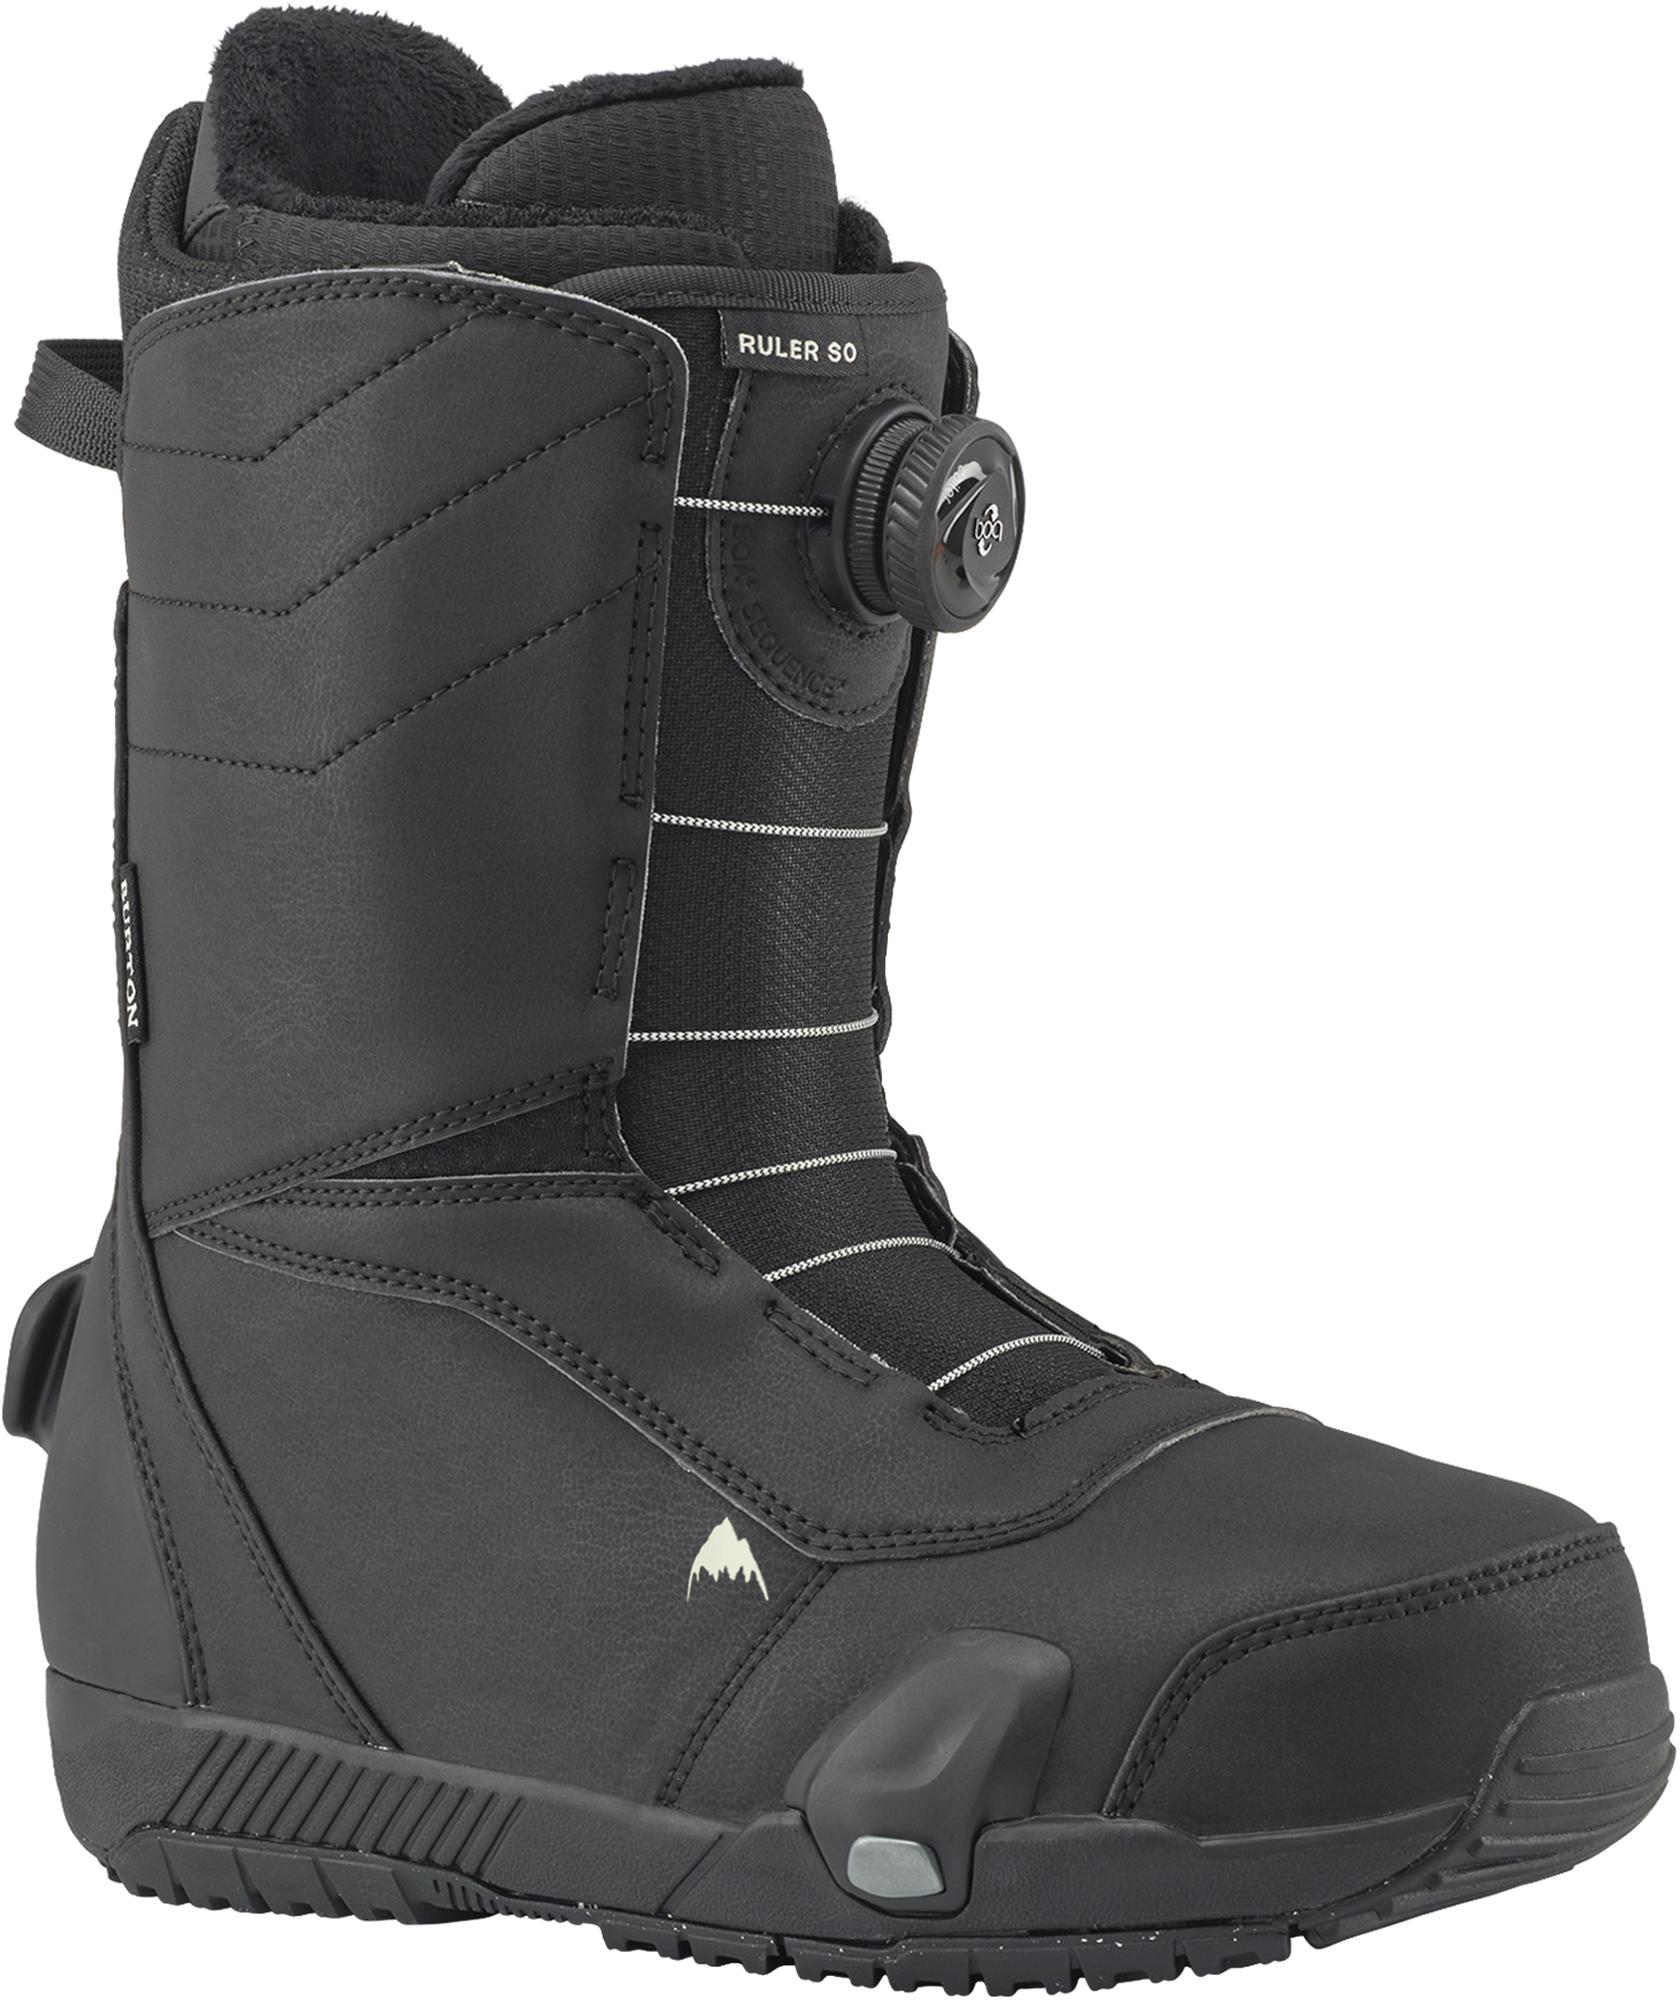 Burton Сноубордические ботинки Ruler Step On, размер 42